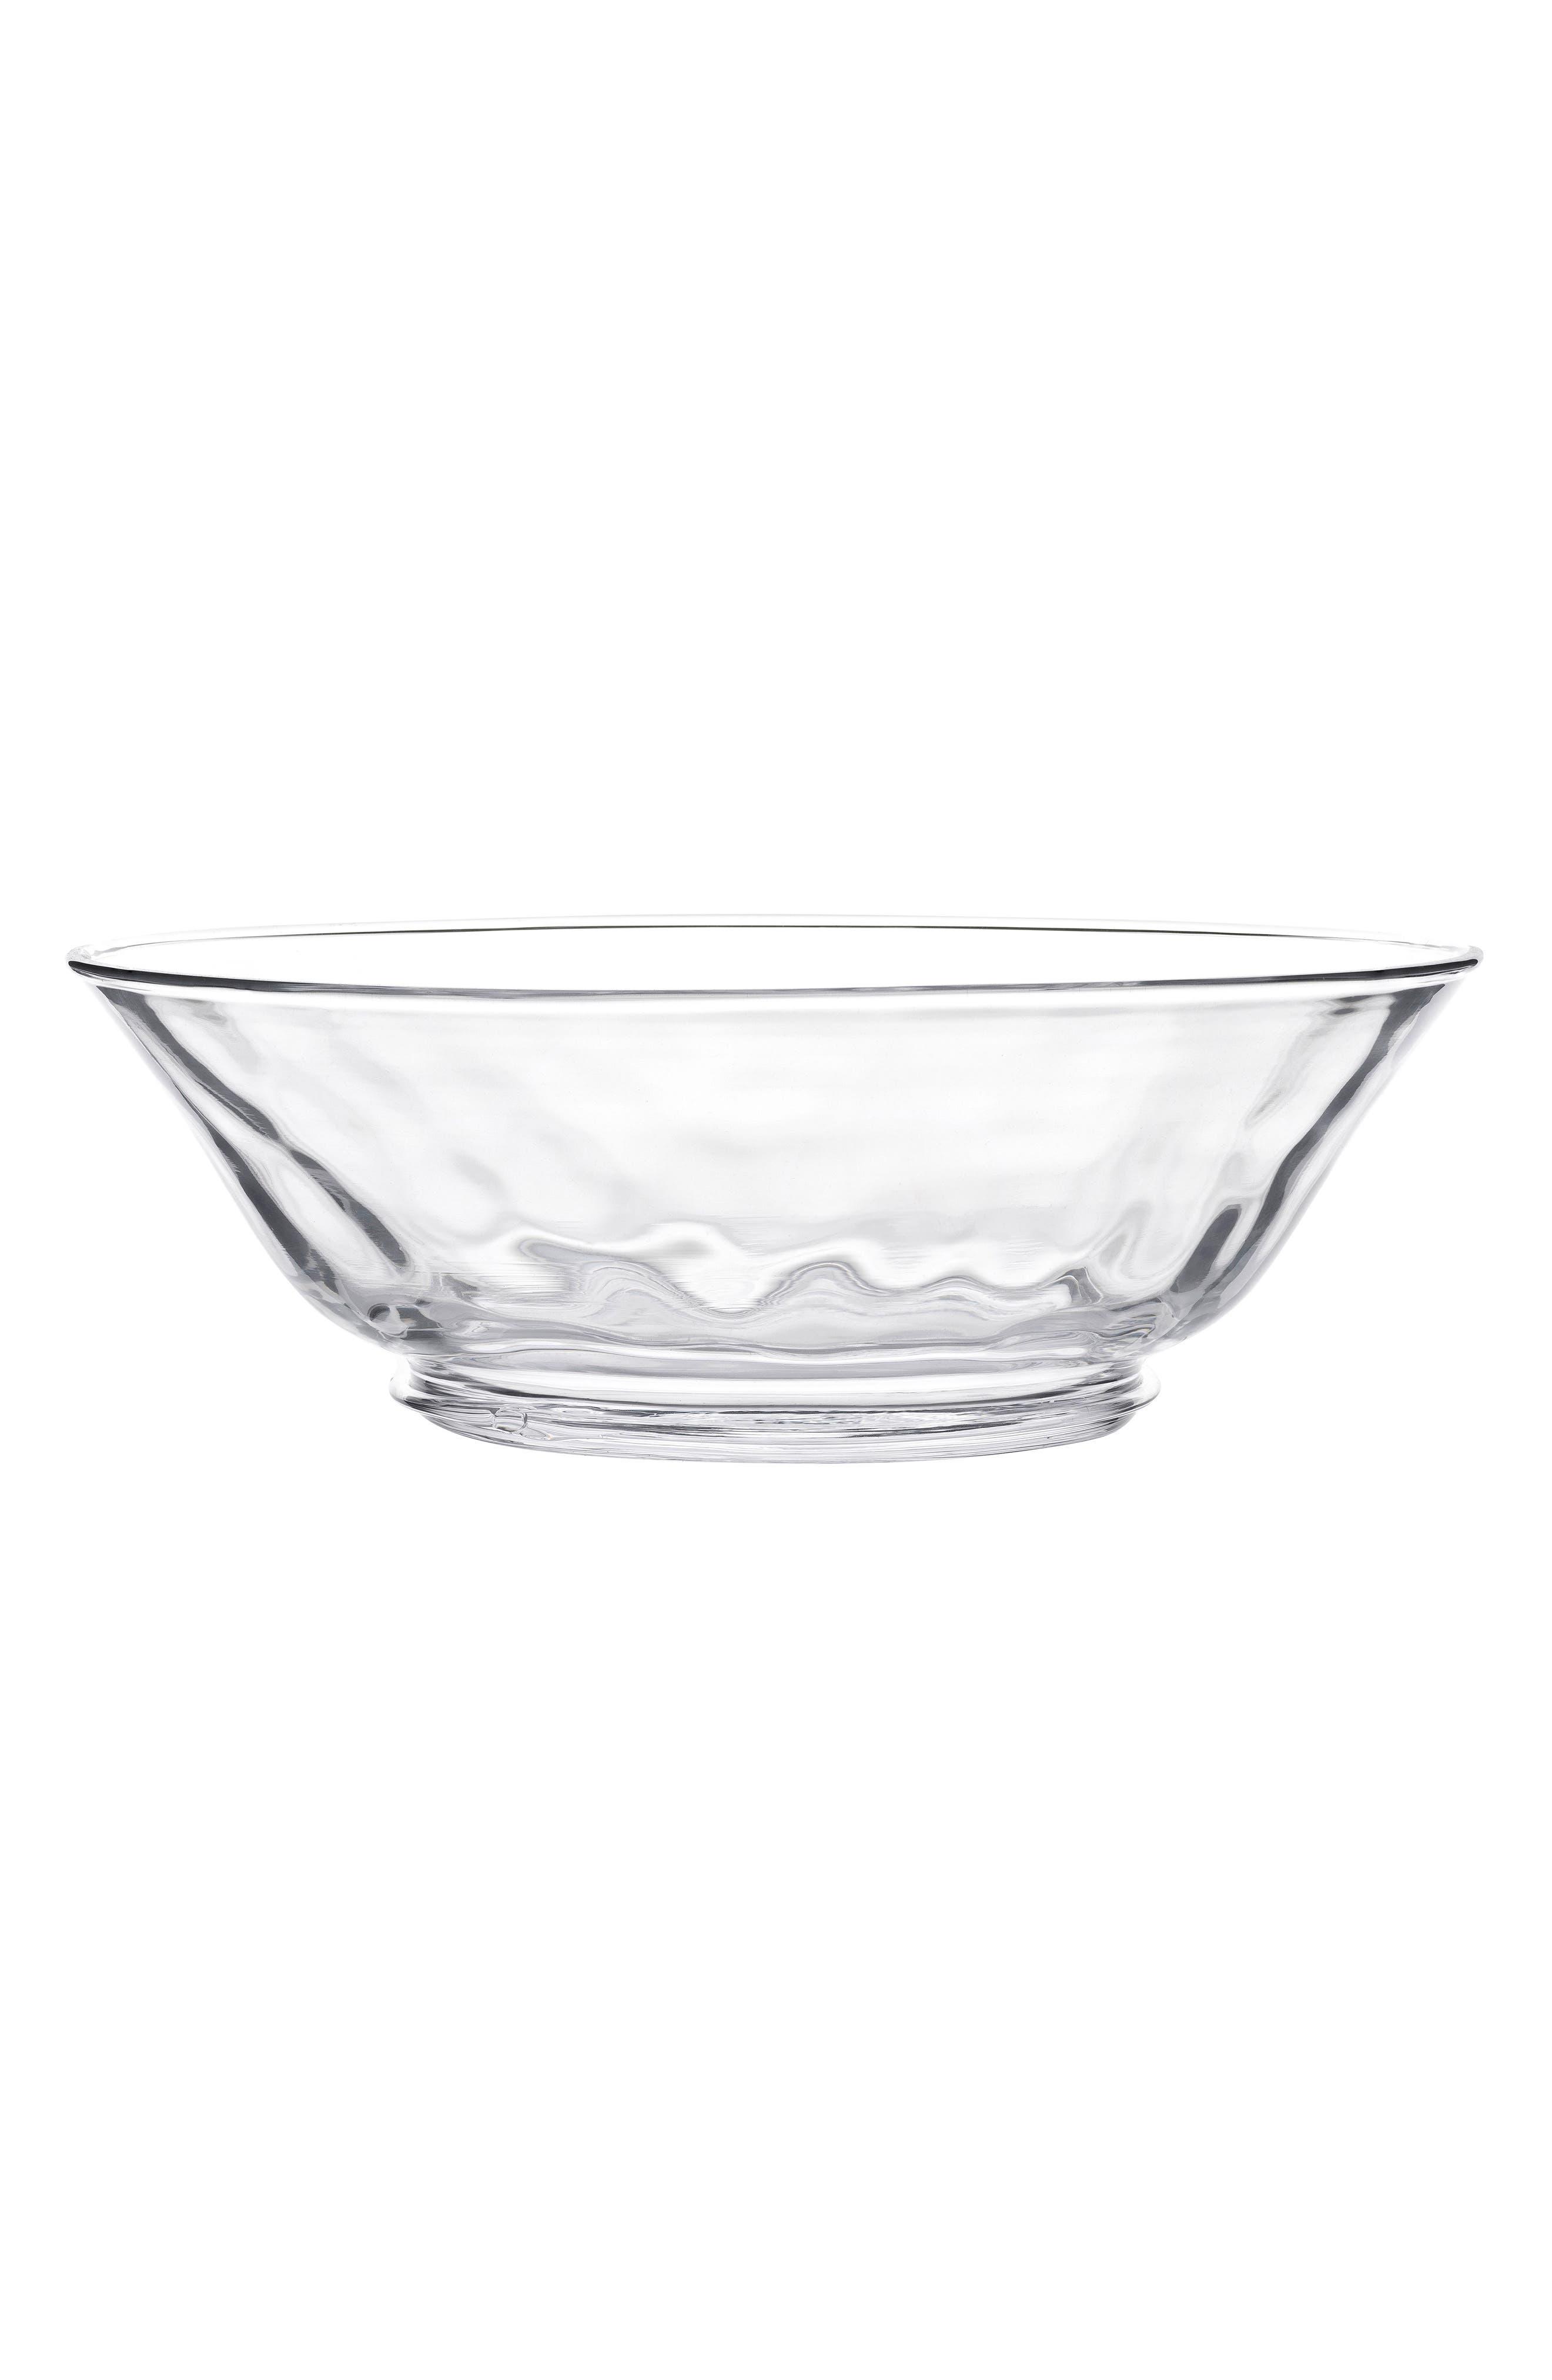 Carine Bowl,                             Alternate thumbnail 2, color,                             CLEAR